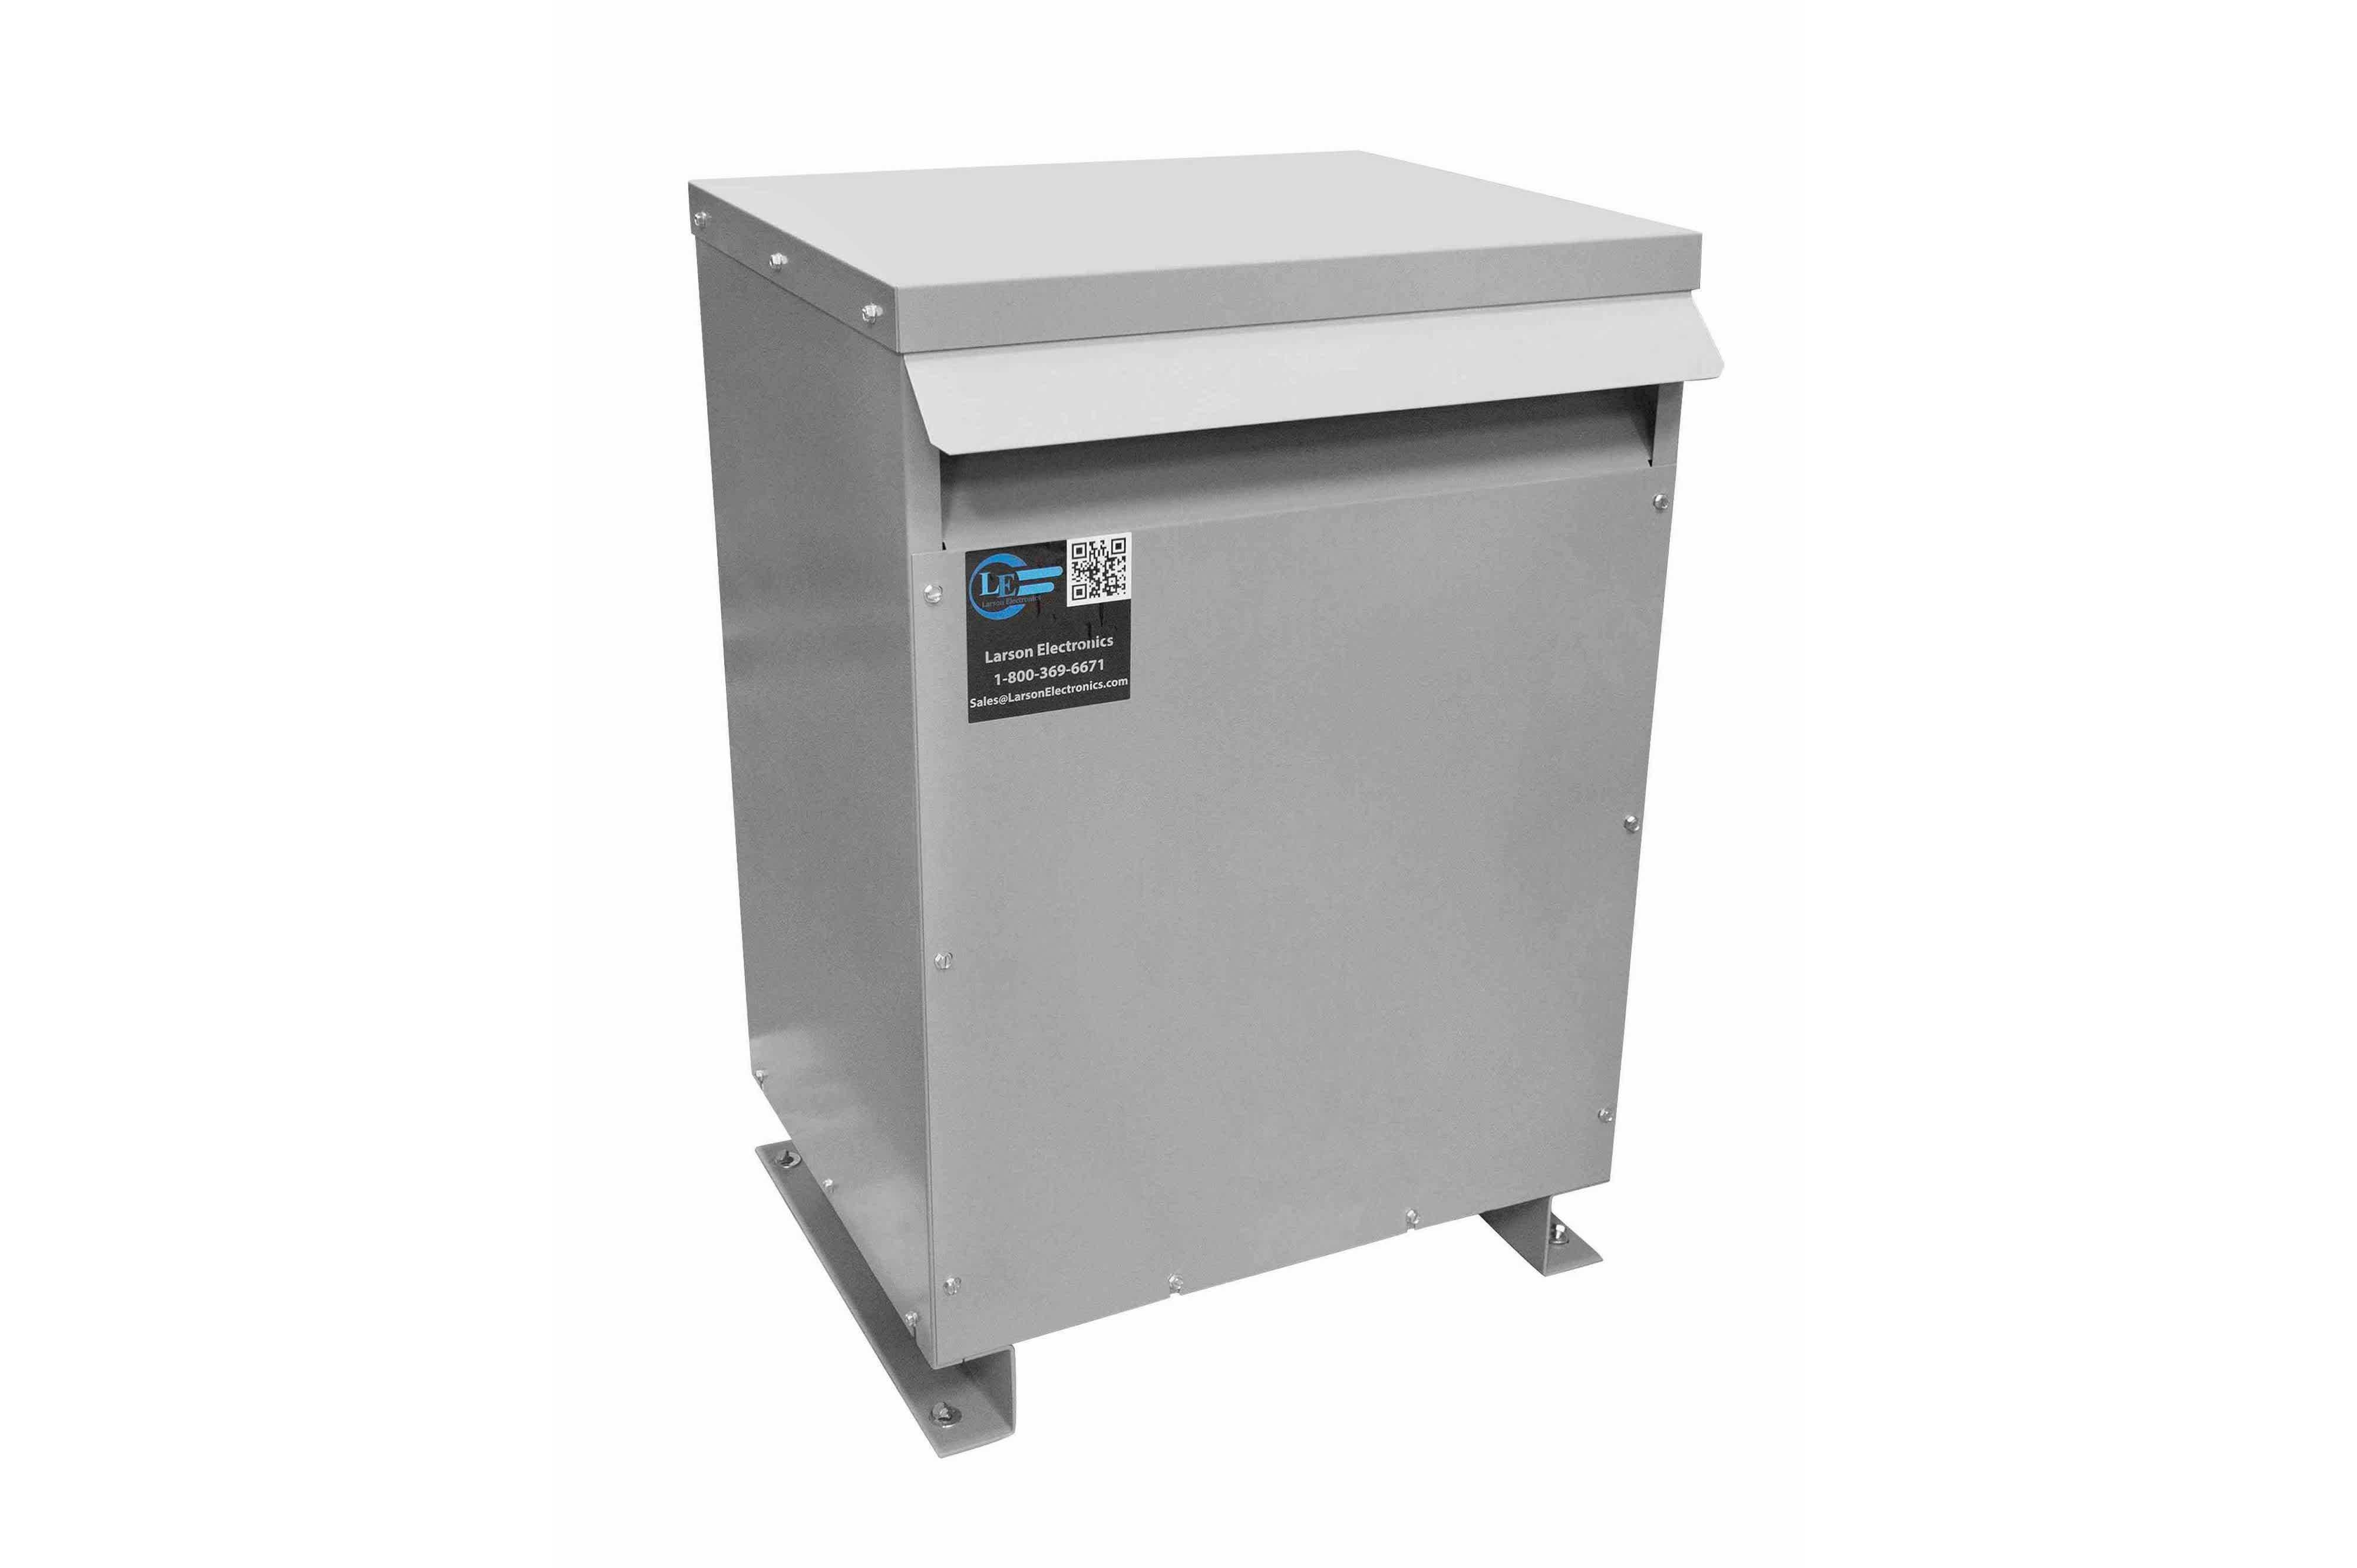 112.5 kVA 3PH Isolation Transformer, 460V Wye Primary, 600Y/347 Wye-N Secondary, N3R, Ventilated, 60 Hz